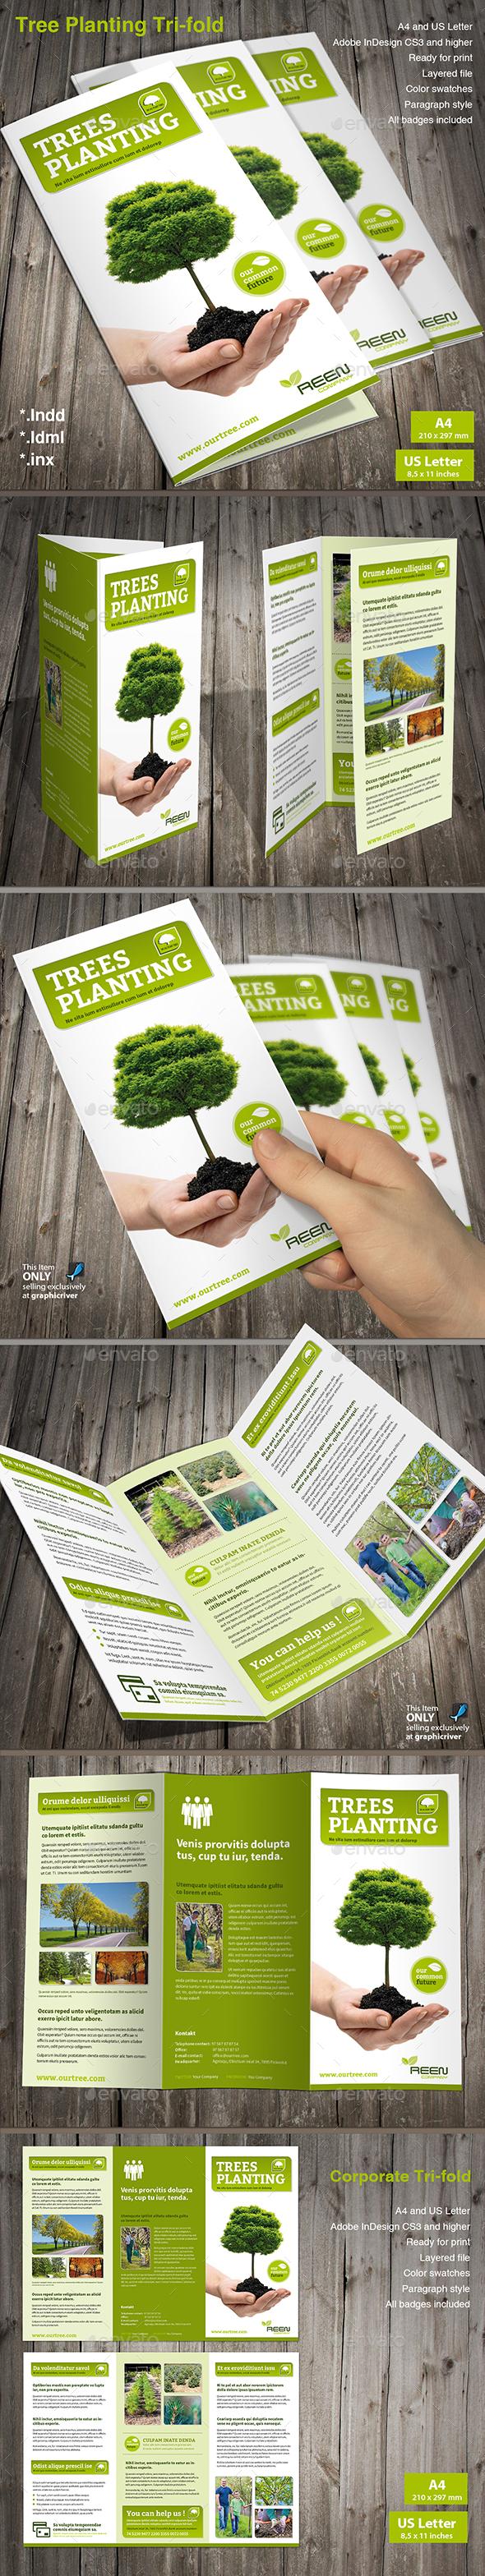 Tree Planting Tri-Fold Brochure - Informational Brochures